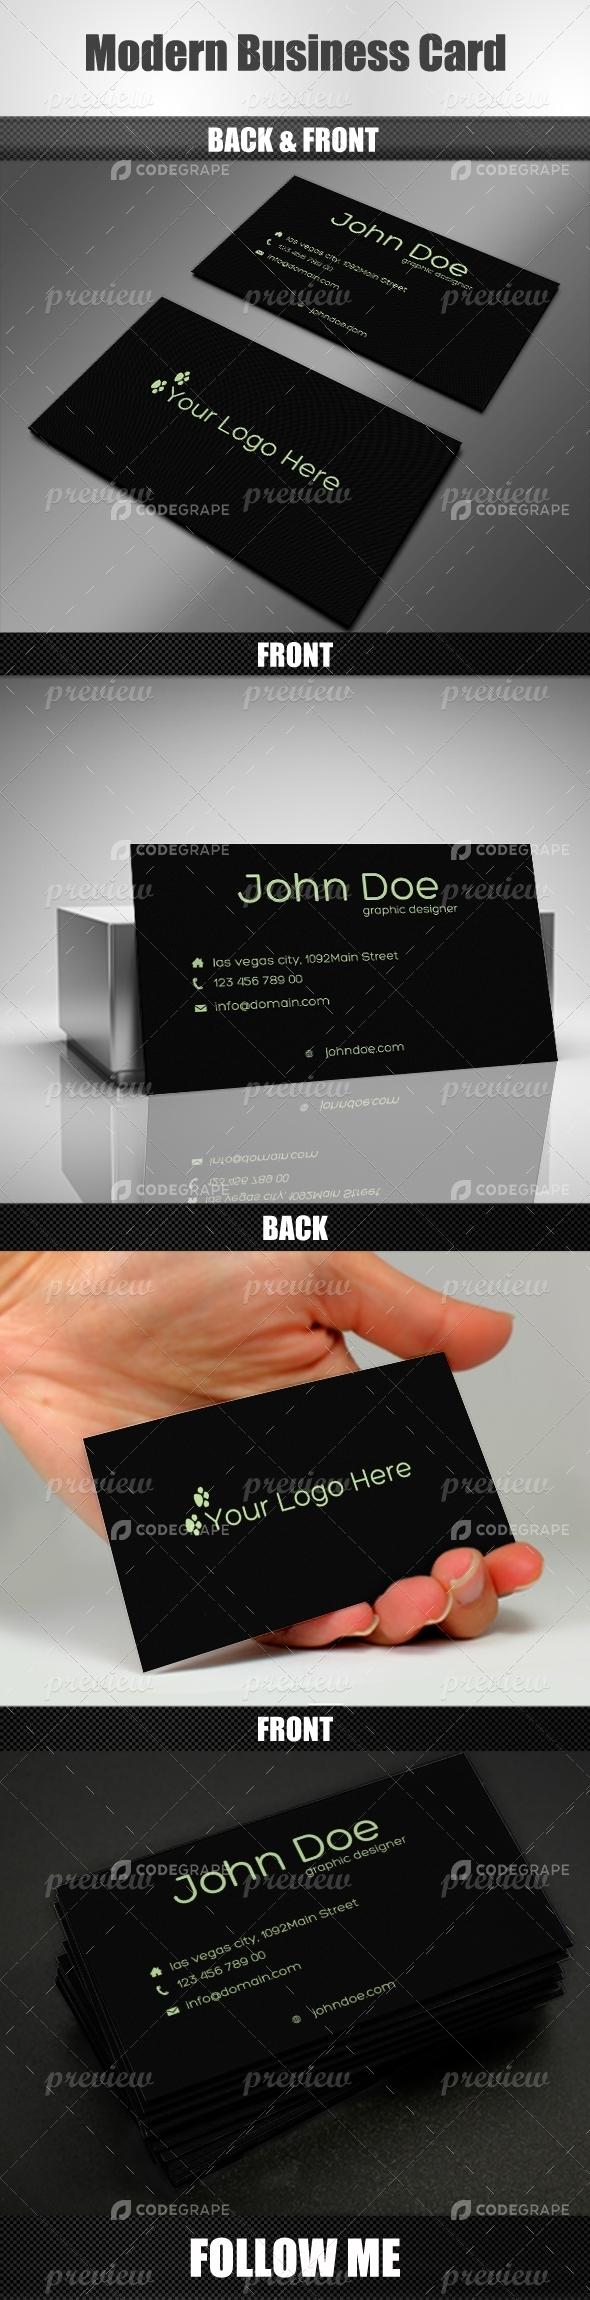 Modern Business Card v3